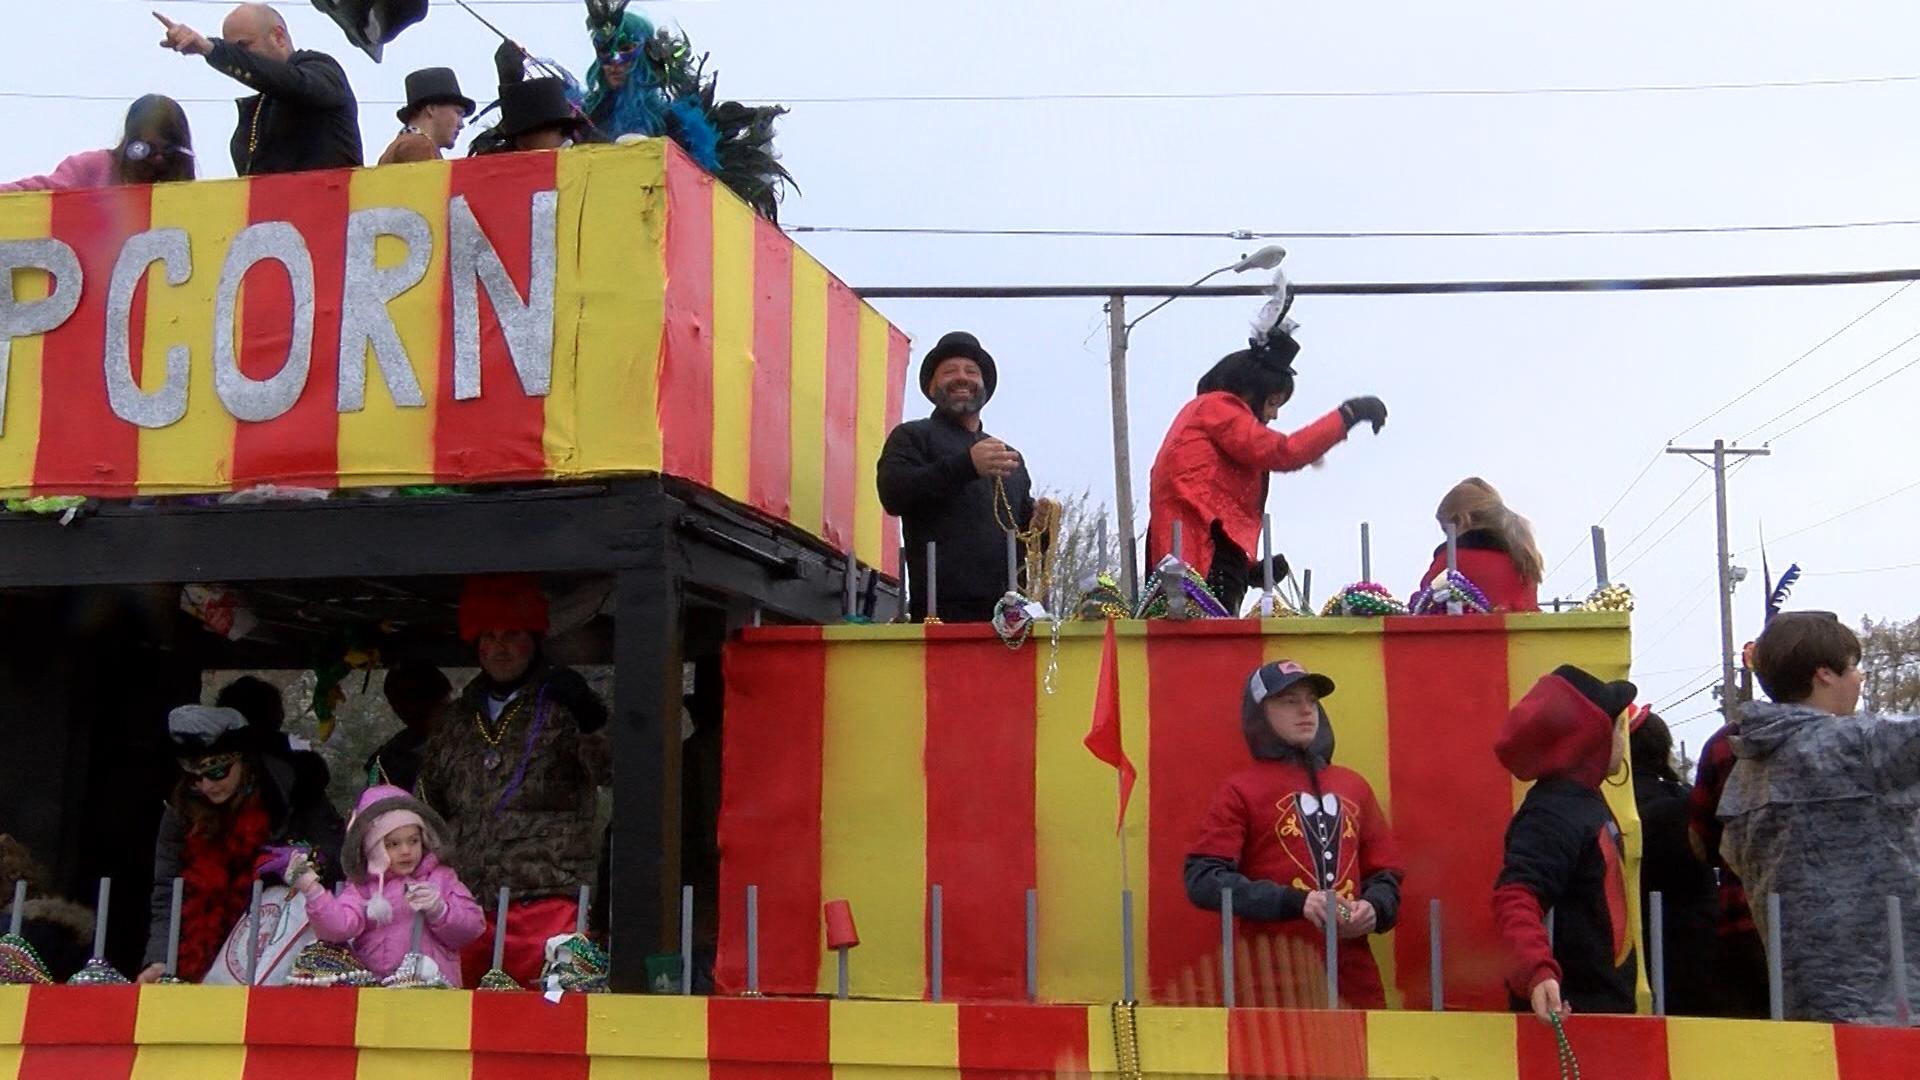 parade highland_1551658980513.jpg.jpg